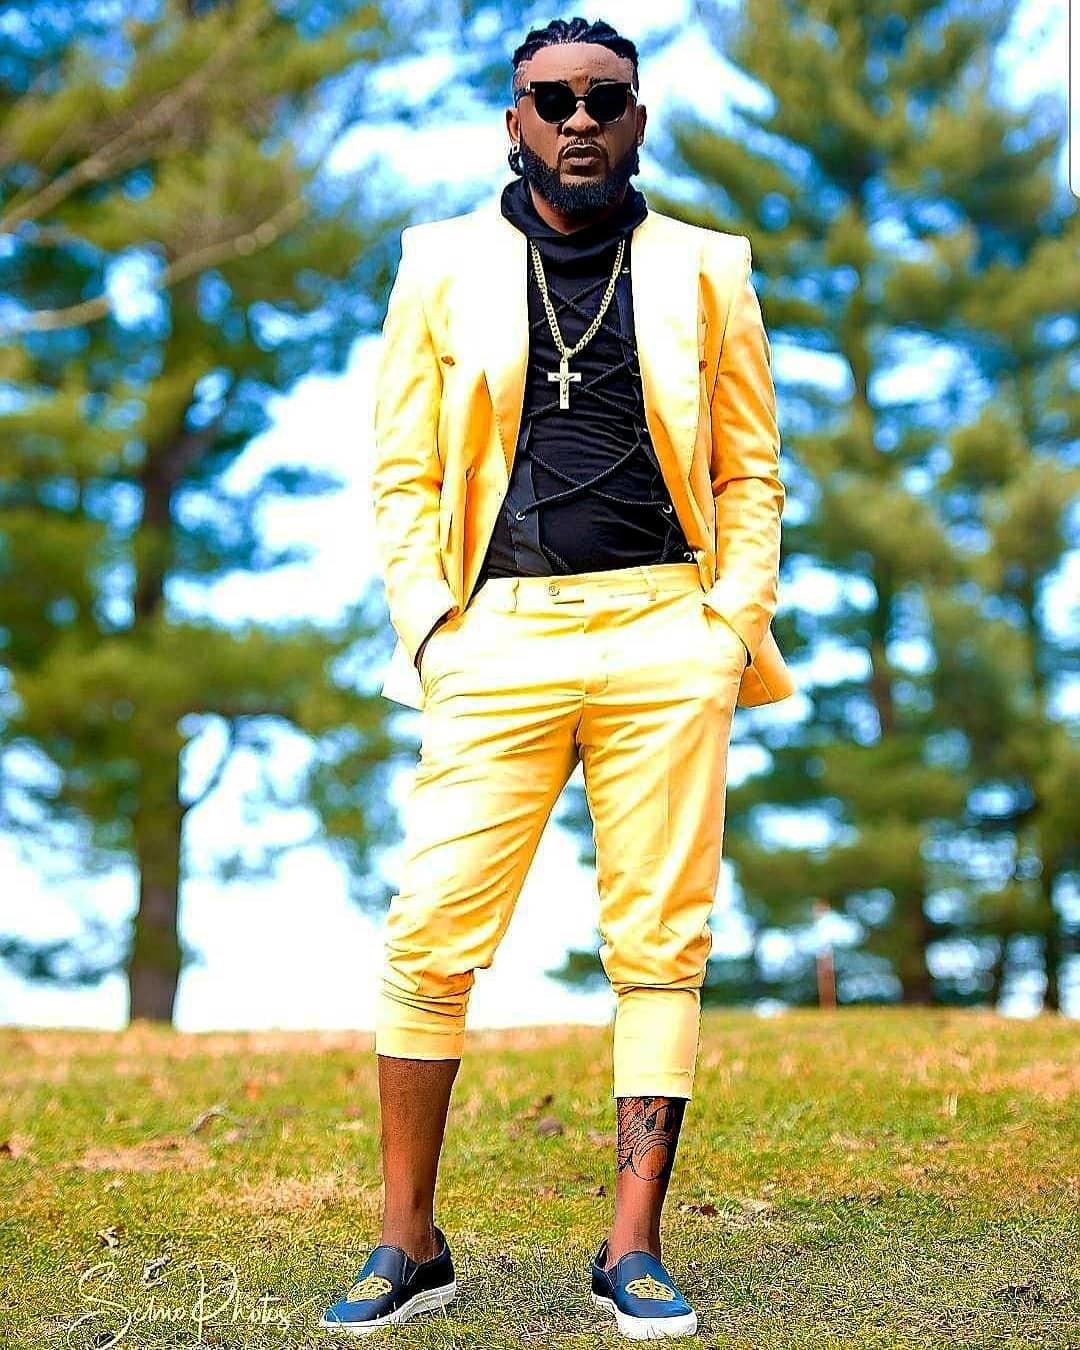 African Celebrities including Terence Dexter